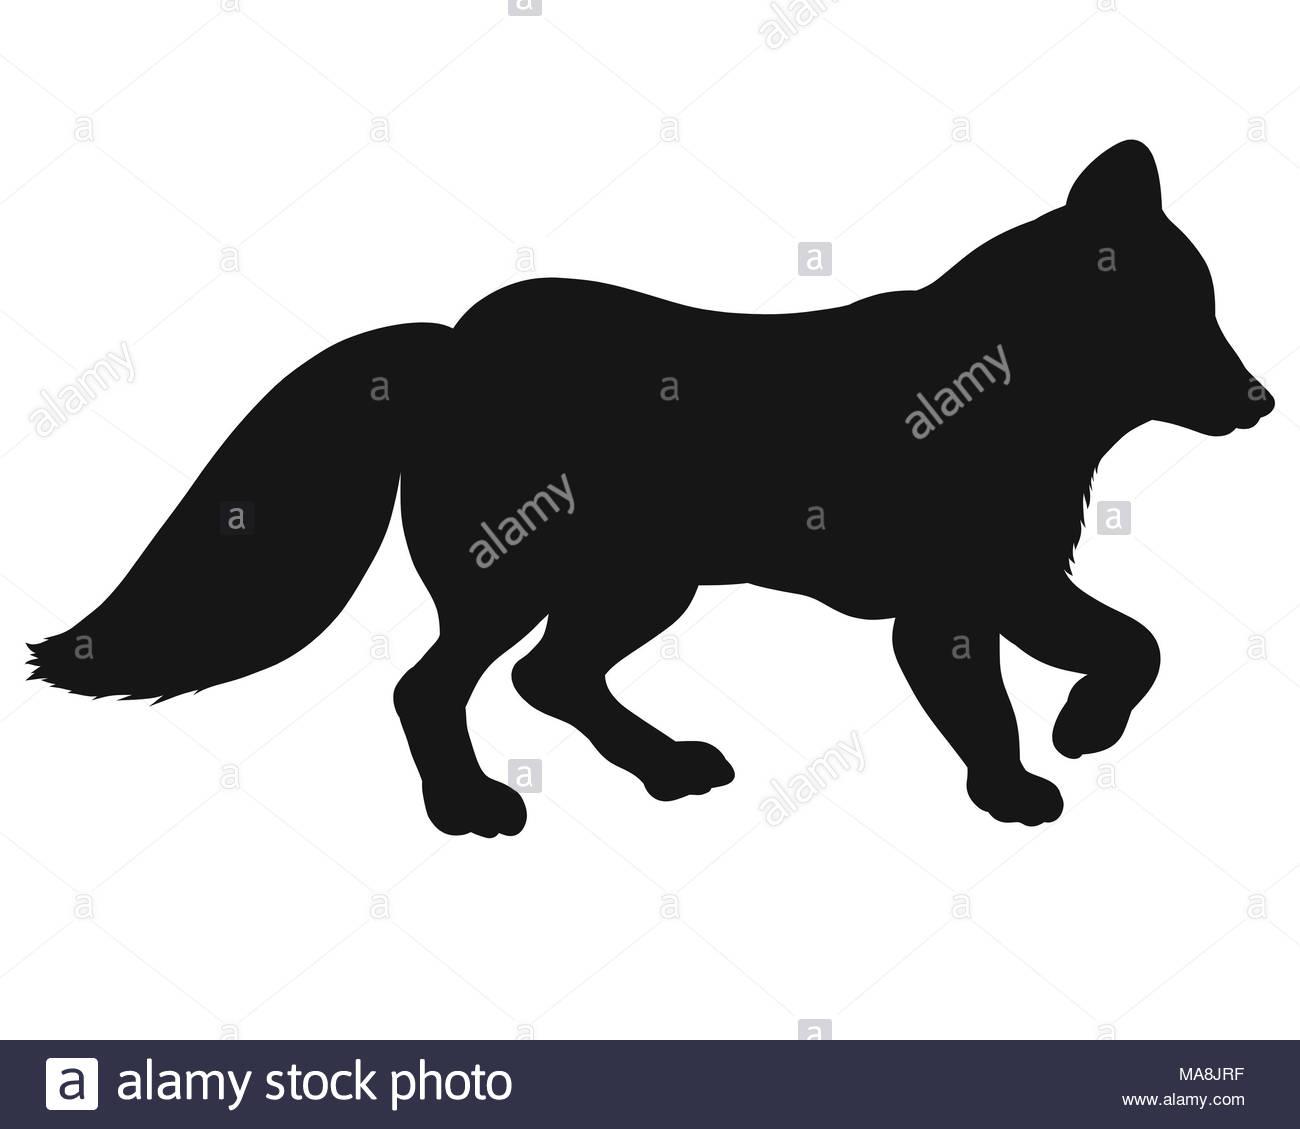 Black silhouette of a walking fox - Stock Image